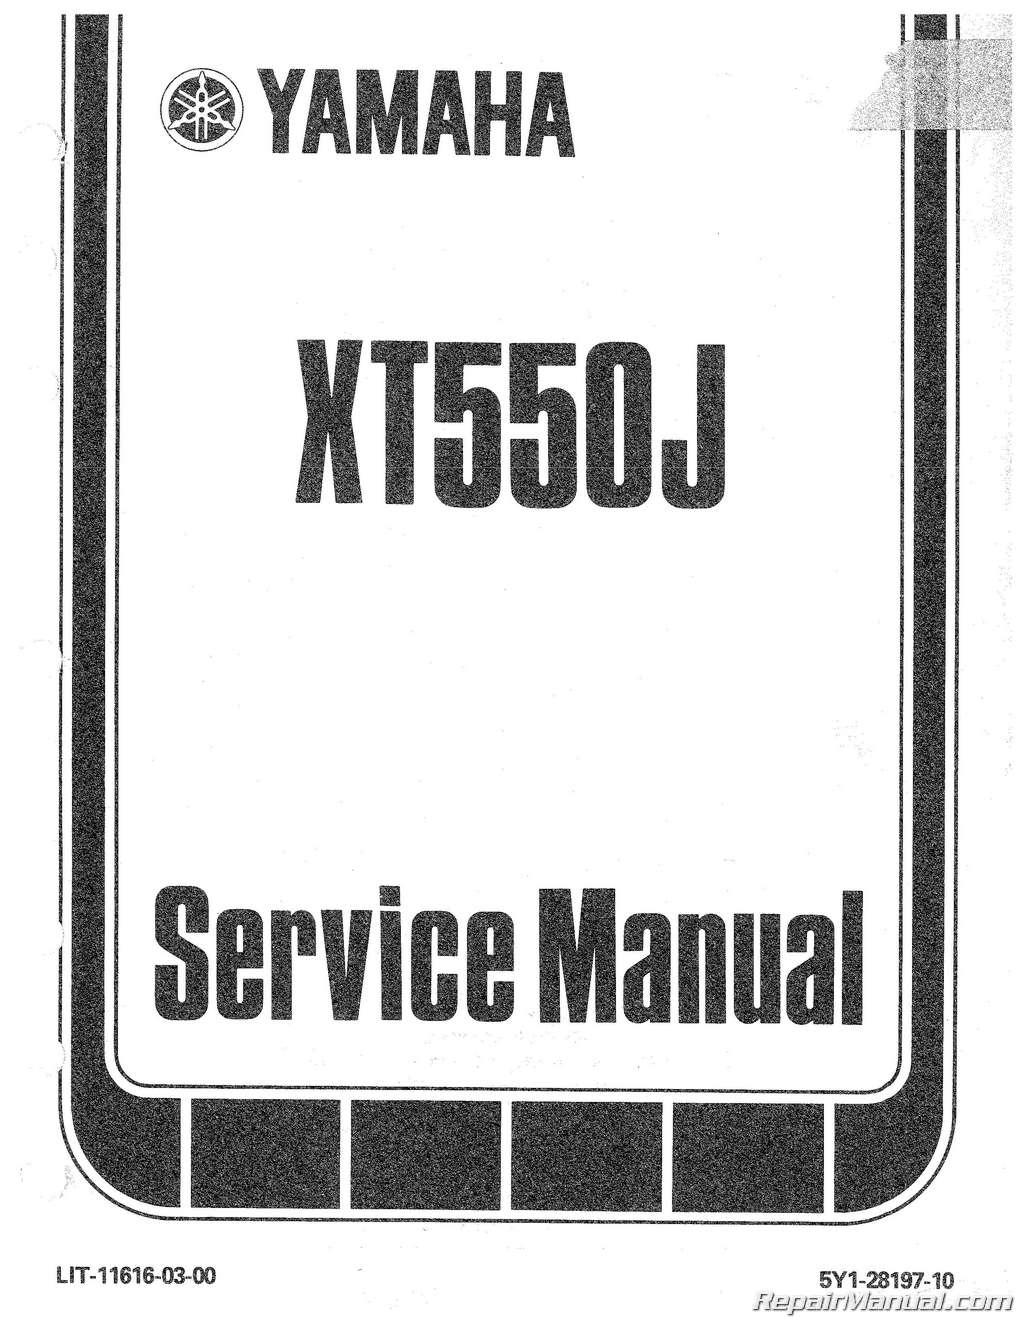 hight resolution of 1982 yamaha xt550 motorcycle service repair maintenance manual 1984 yamaha xt 600 yamaha xt 550 wiring diagram